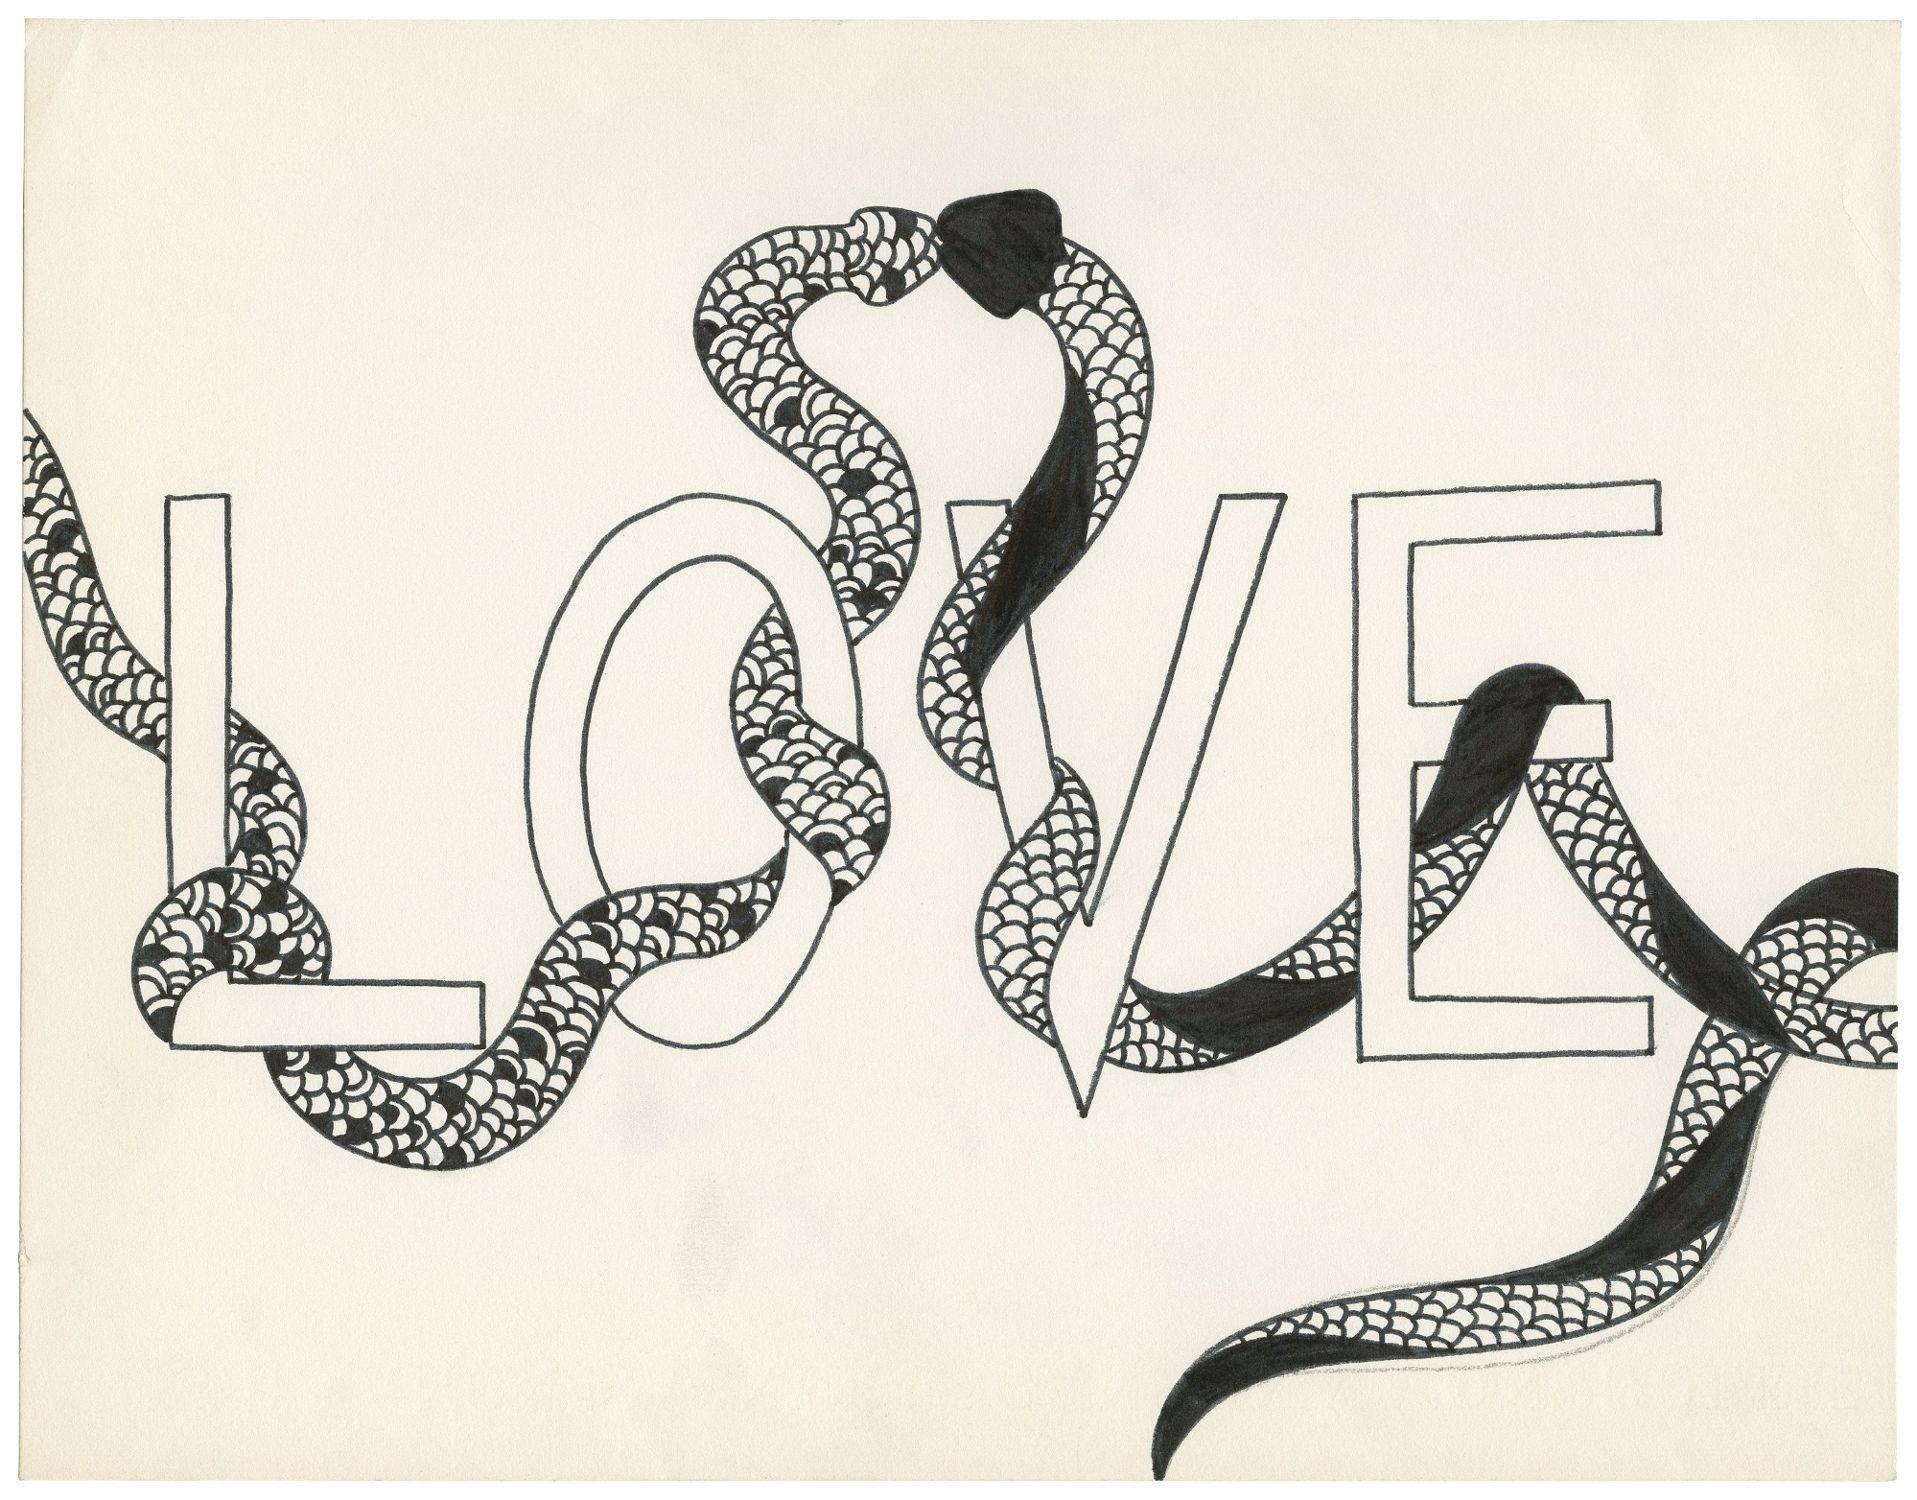 Coloring book yves saint laurent - Yves Saint Laurent 1936 2008 Love Etude 1970